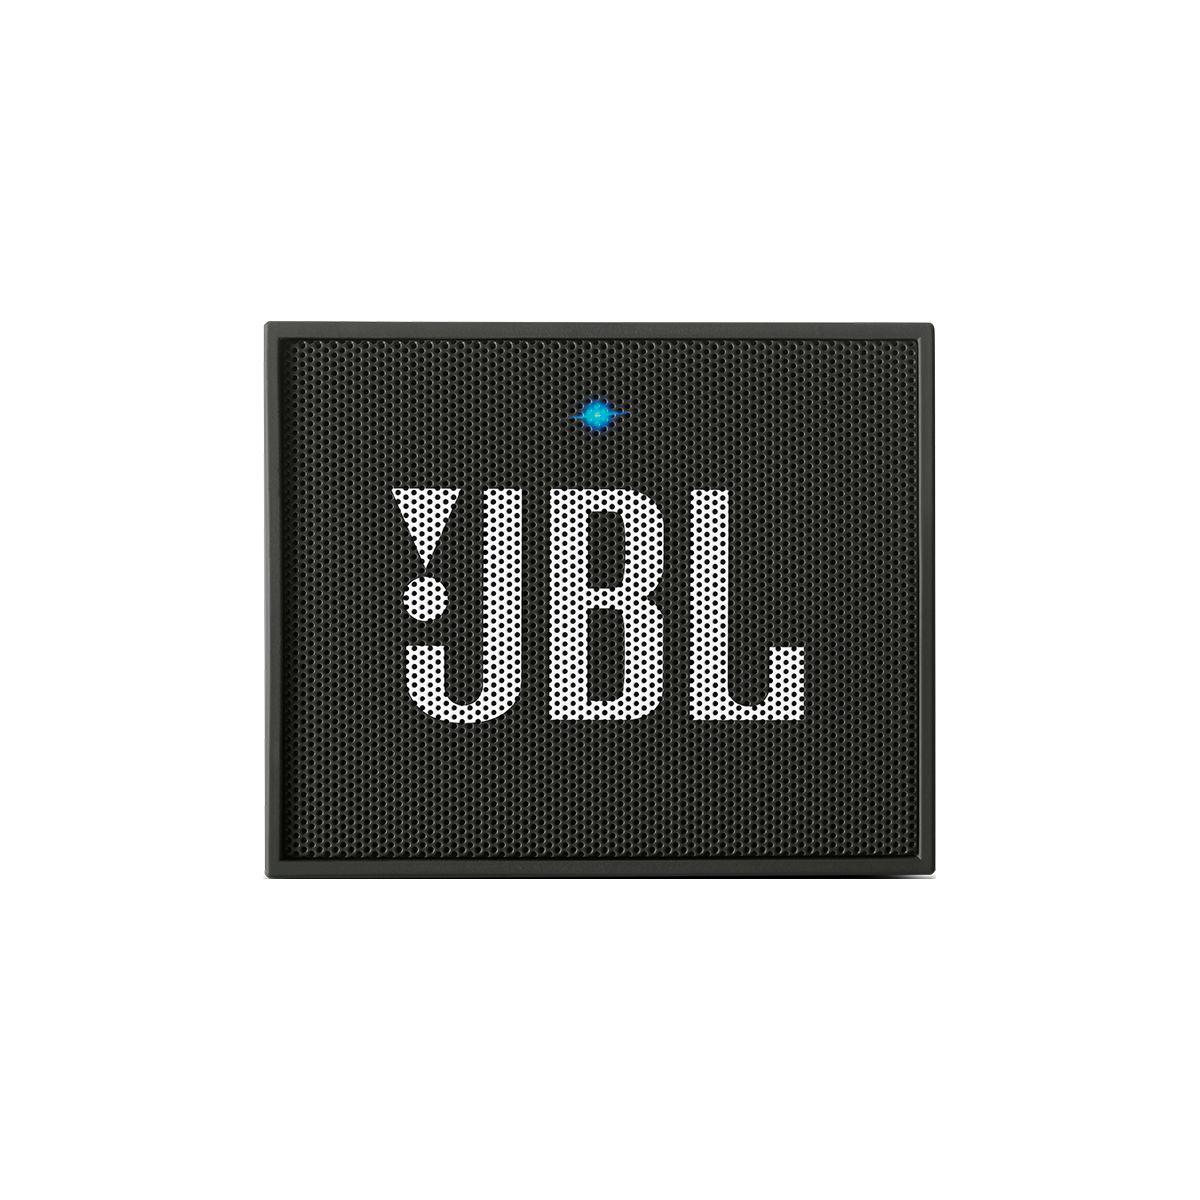 Enceinte bluetooth jbl go noir - livraison offerte : code liv (photo)